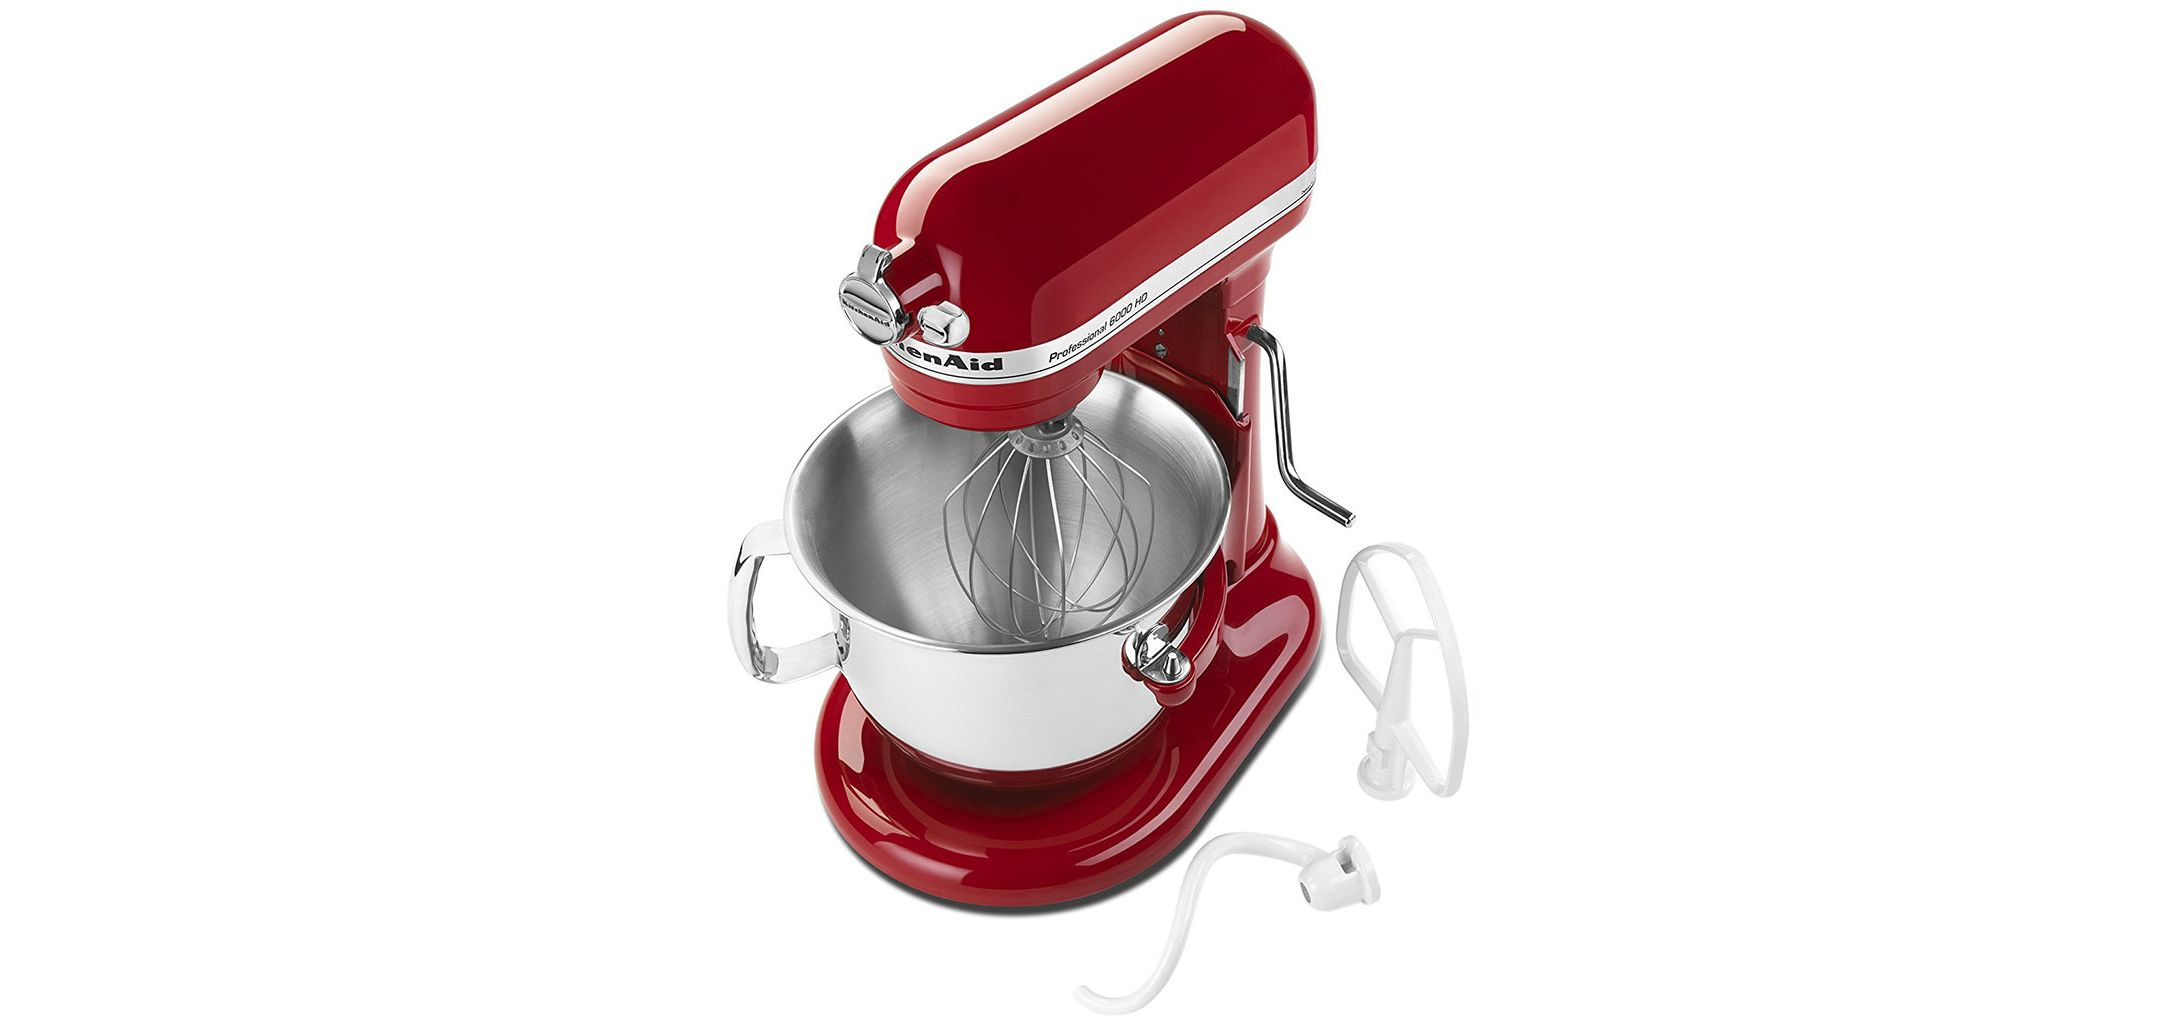 kitchenaid mixer professional 5 plus parts